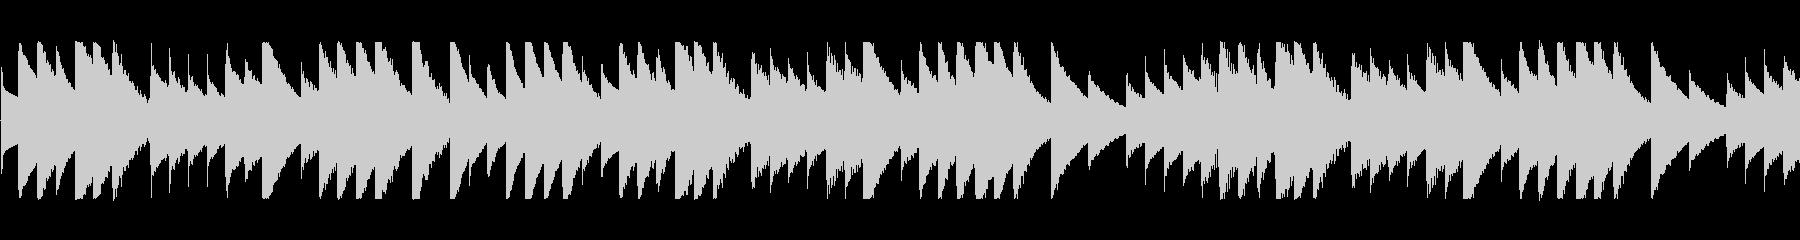 Okinawan folk song / Tinsagu nu Hana / Music box's unreproduced waveform